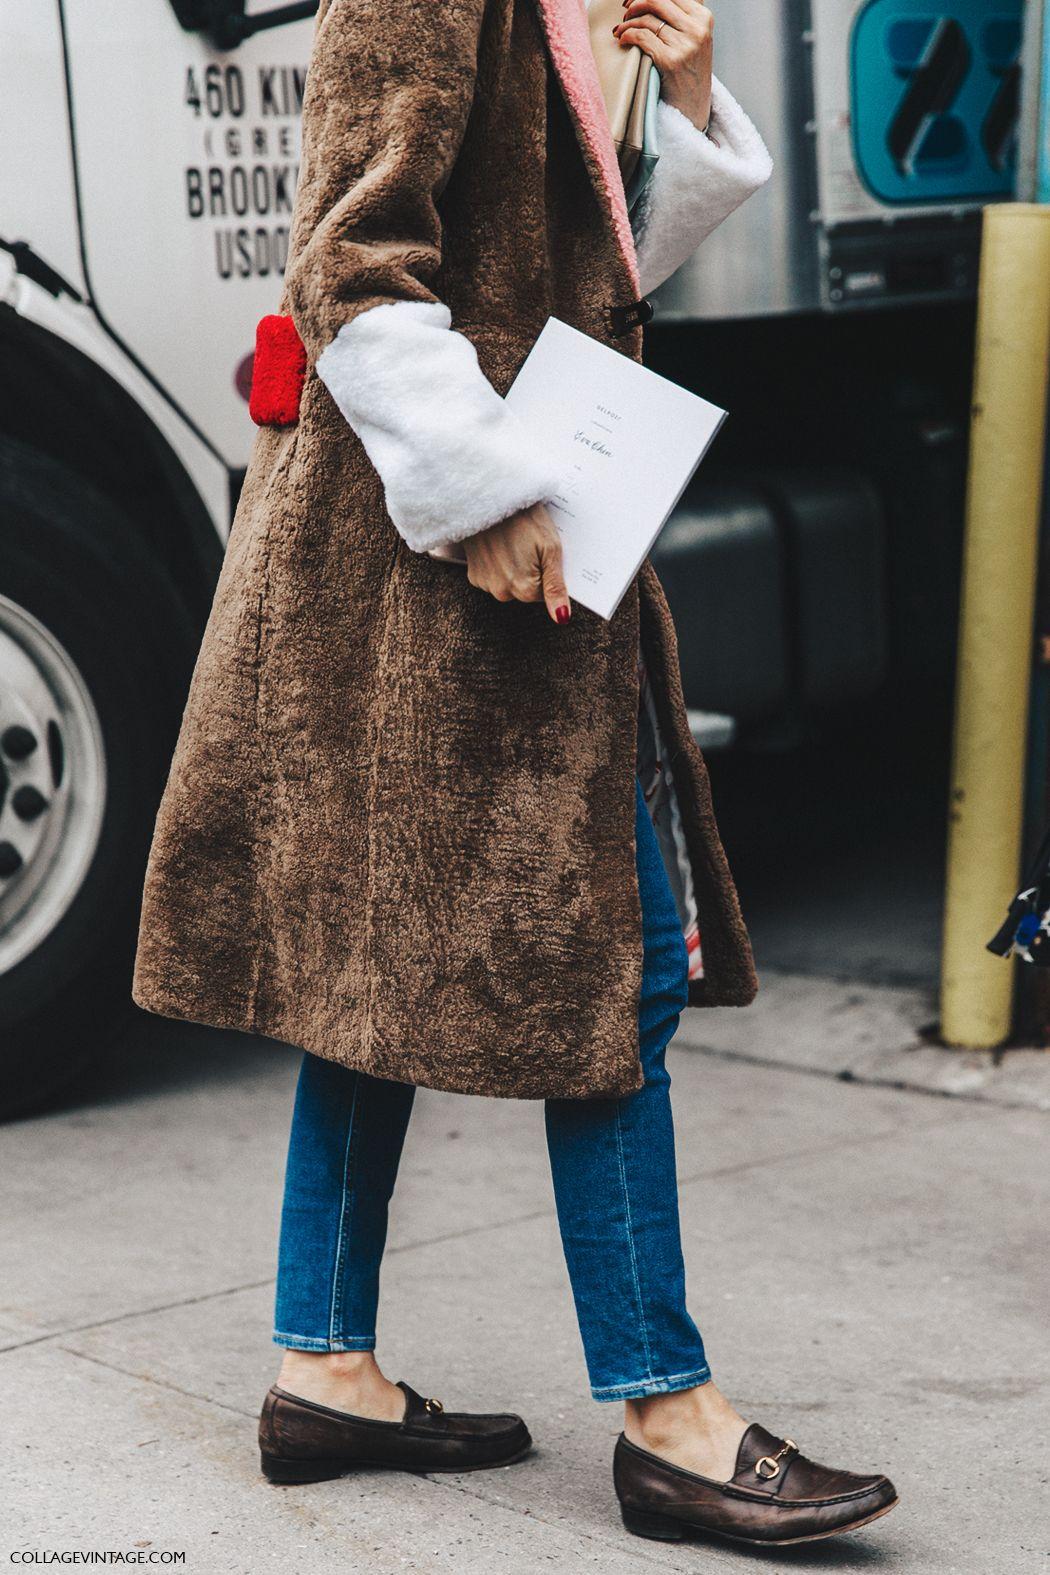 NYFW-New_York_Fashion_Week-Fall_Winter-16-Street_Style-Eva_Chen-Saks_potts_Coat-